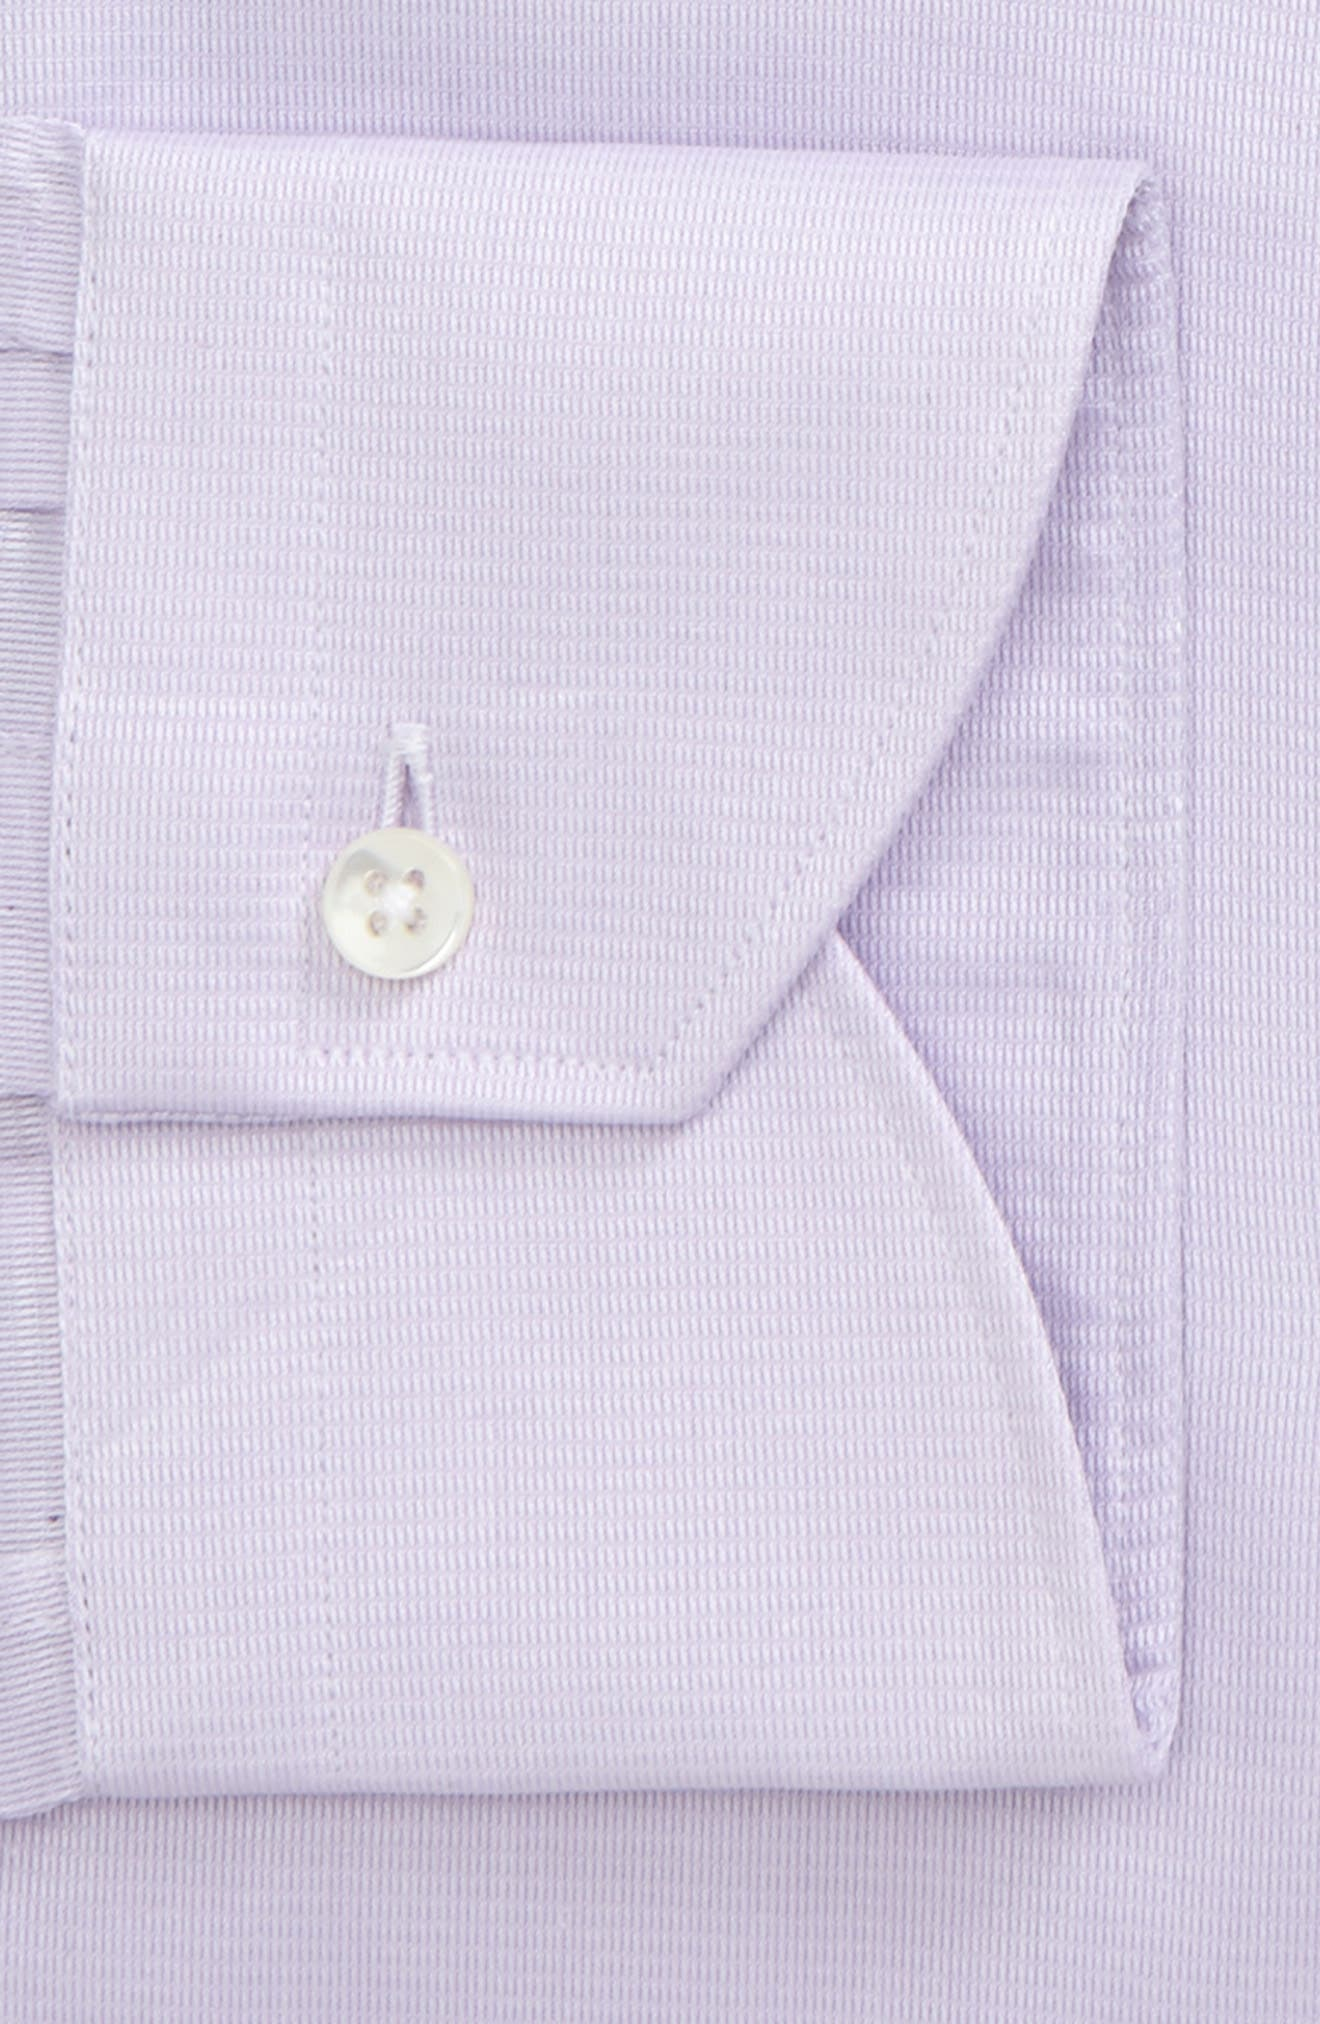 Regular Fit Dress Shirt,                             Alternate thumbnail 2, color,